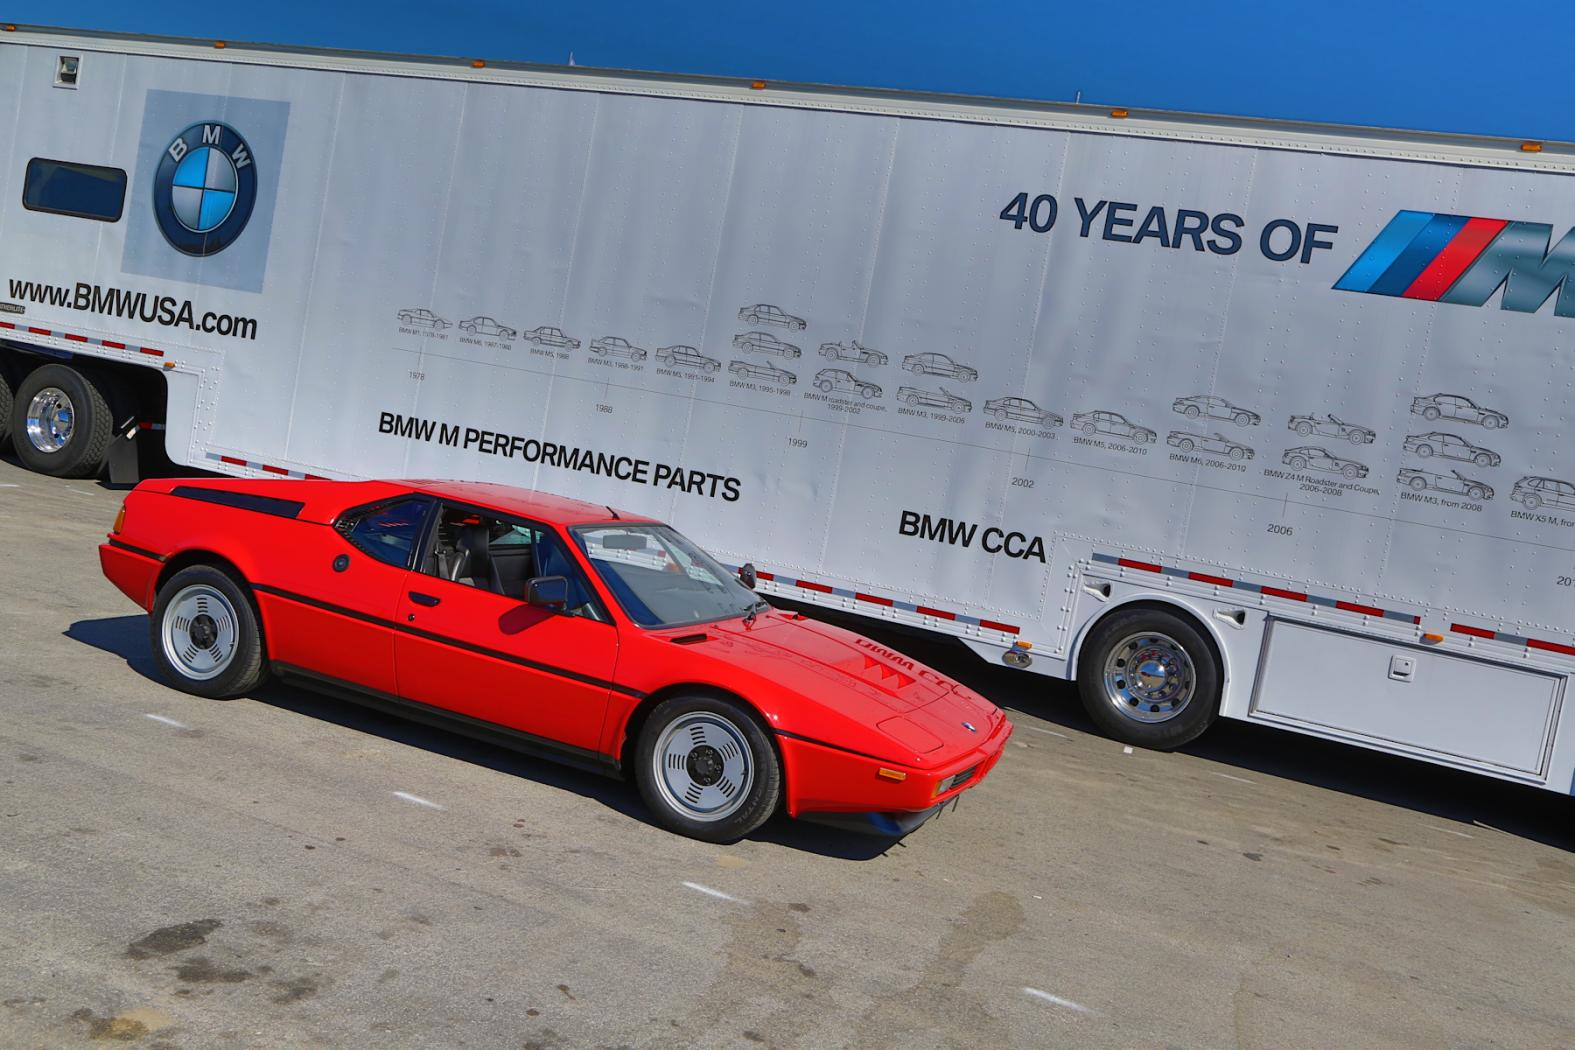 BMW-M1--40-ans-Motorsport.jpeg